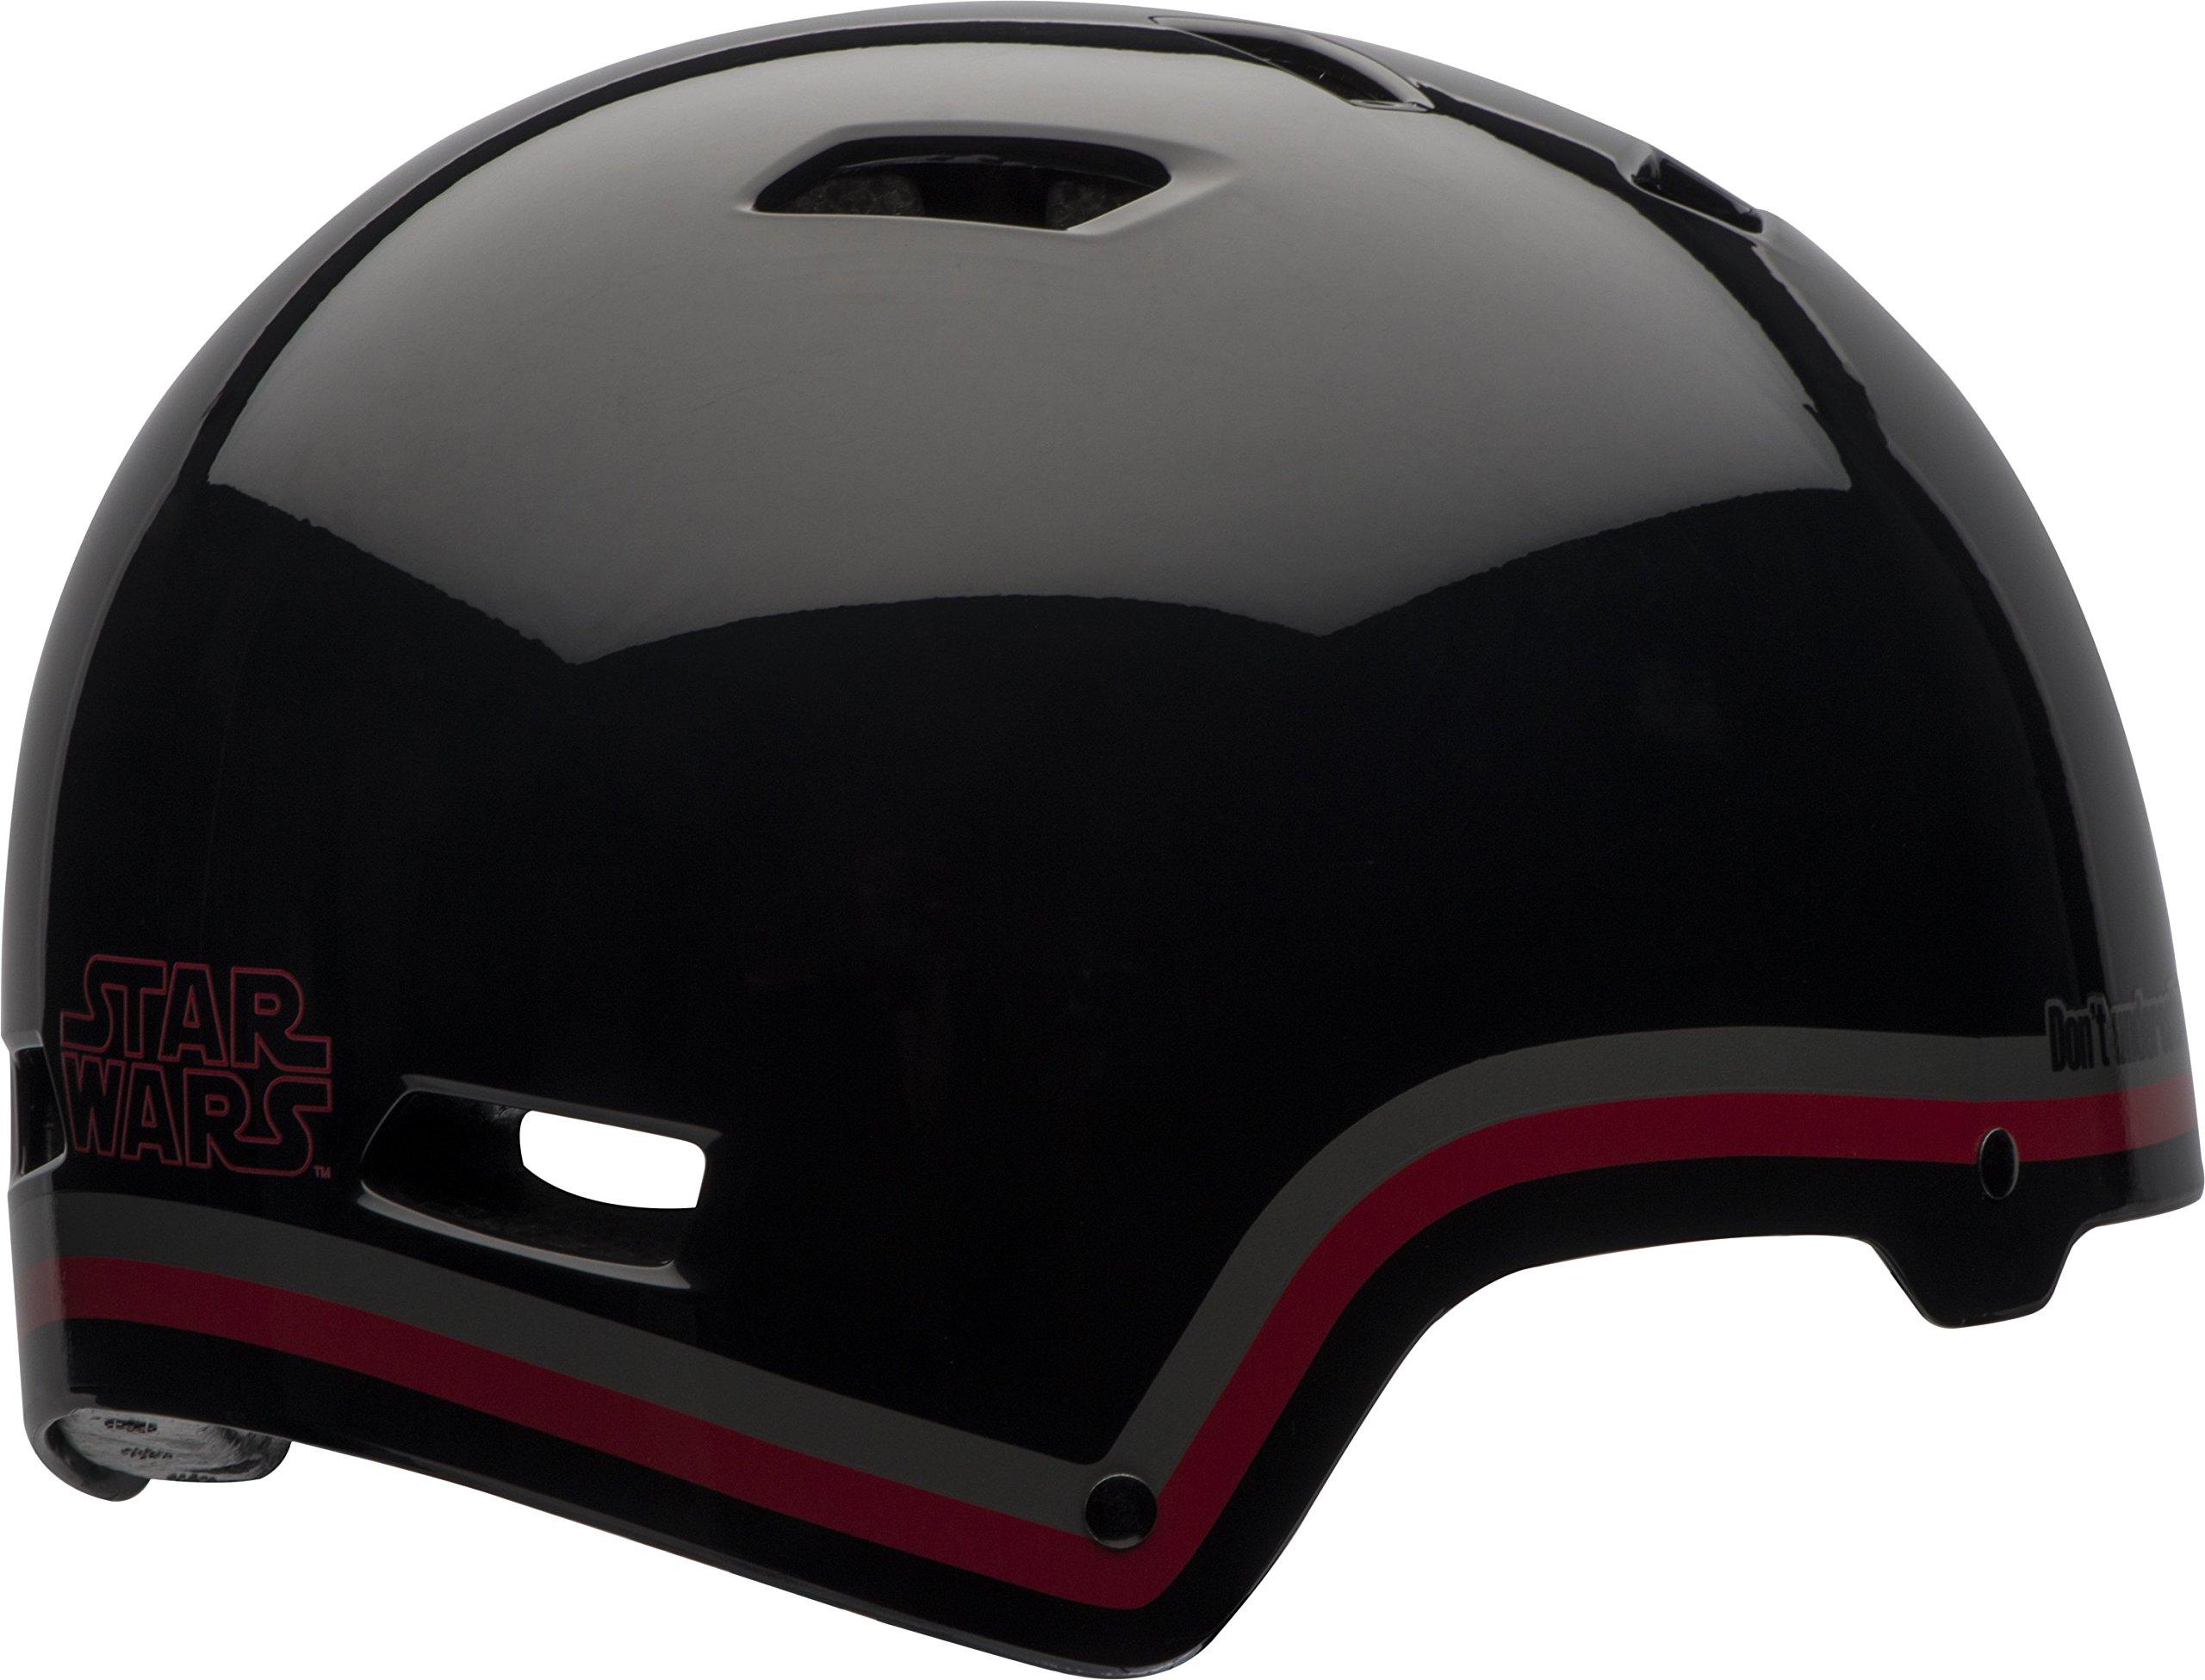 Bell Star Wars Injector Multi Sport Sith Lord Helmet